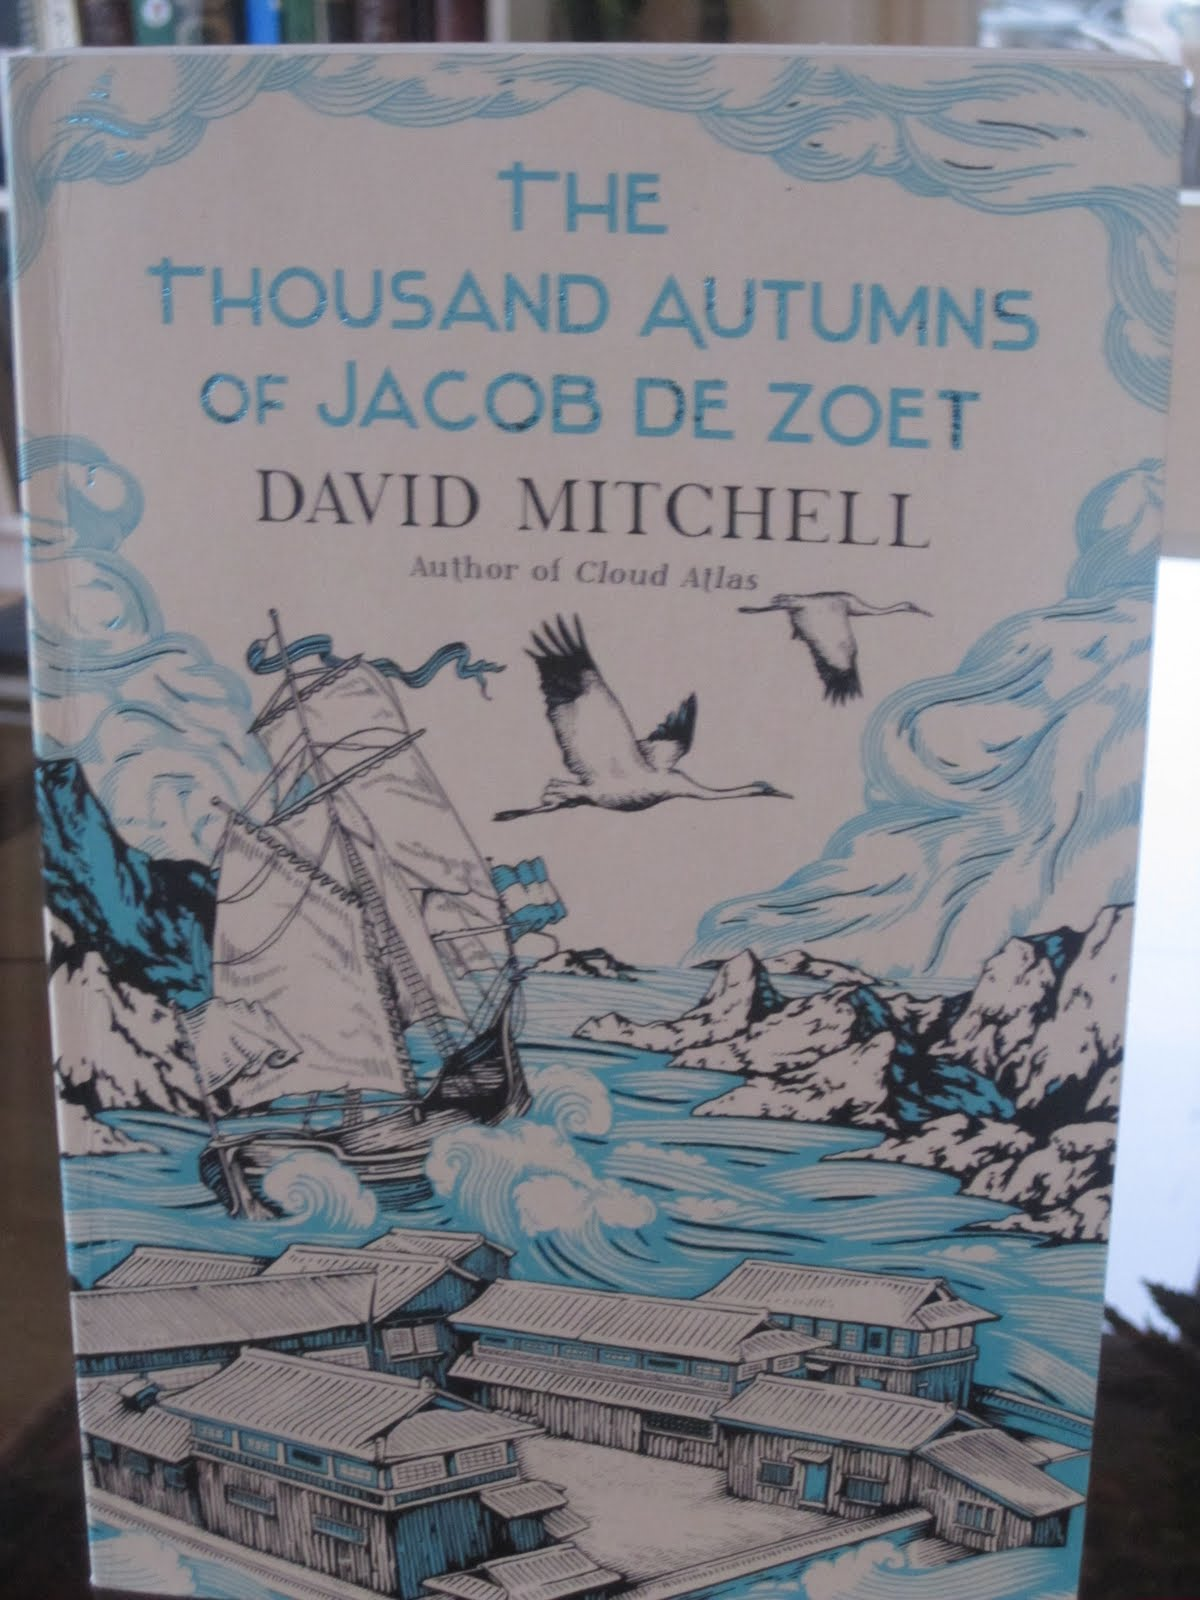 Minleseglede: David Mitchell: The Thousand Autumns of ...